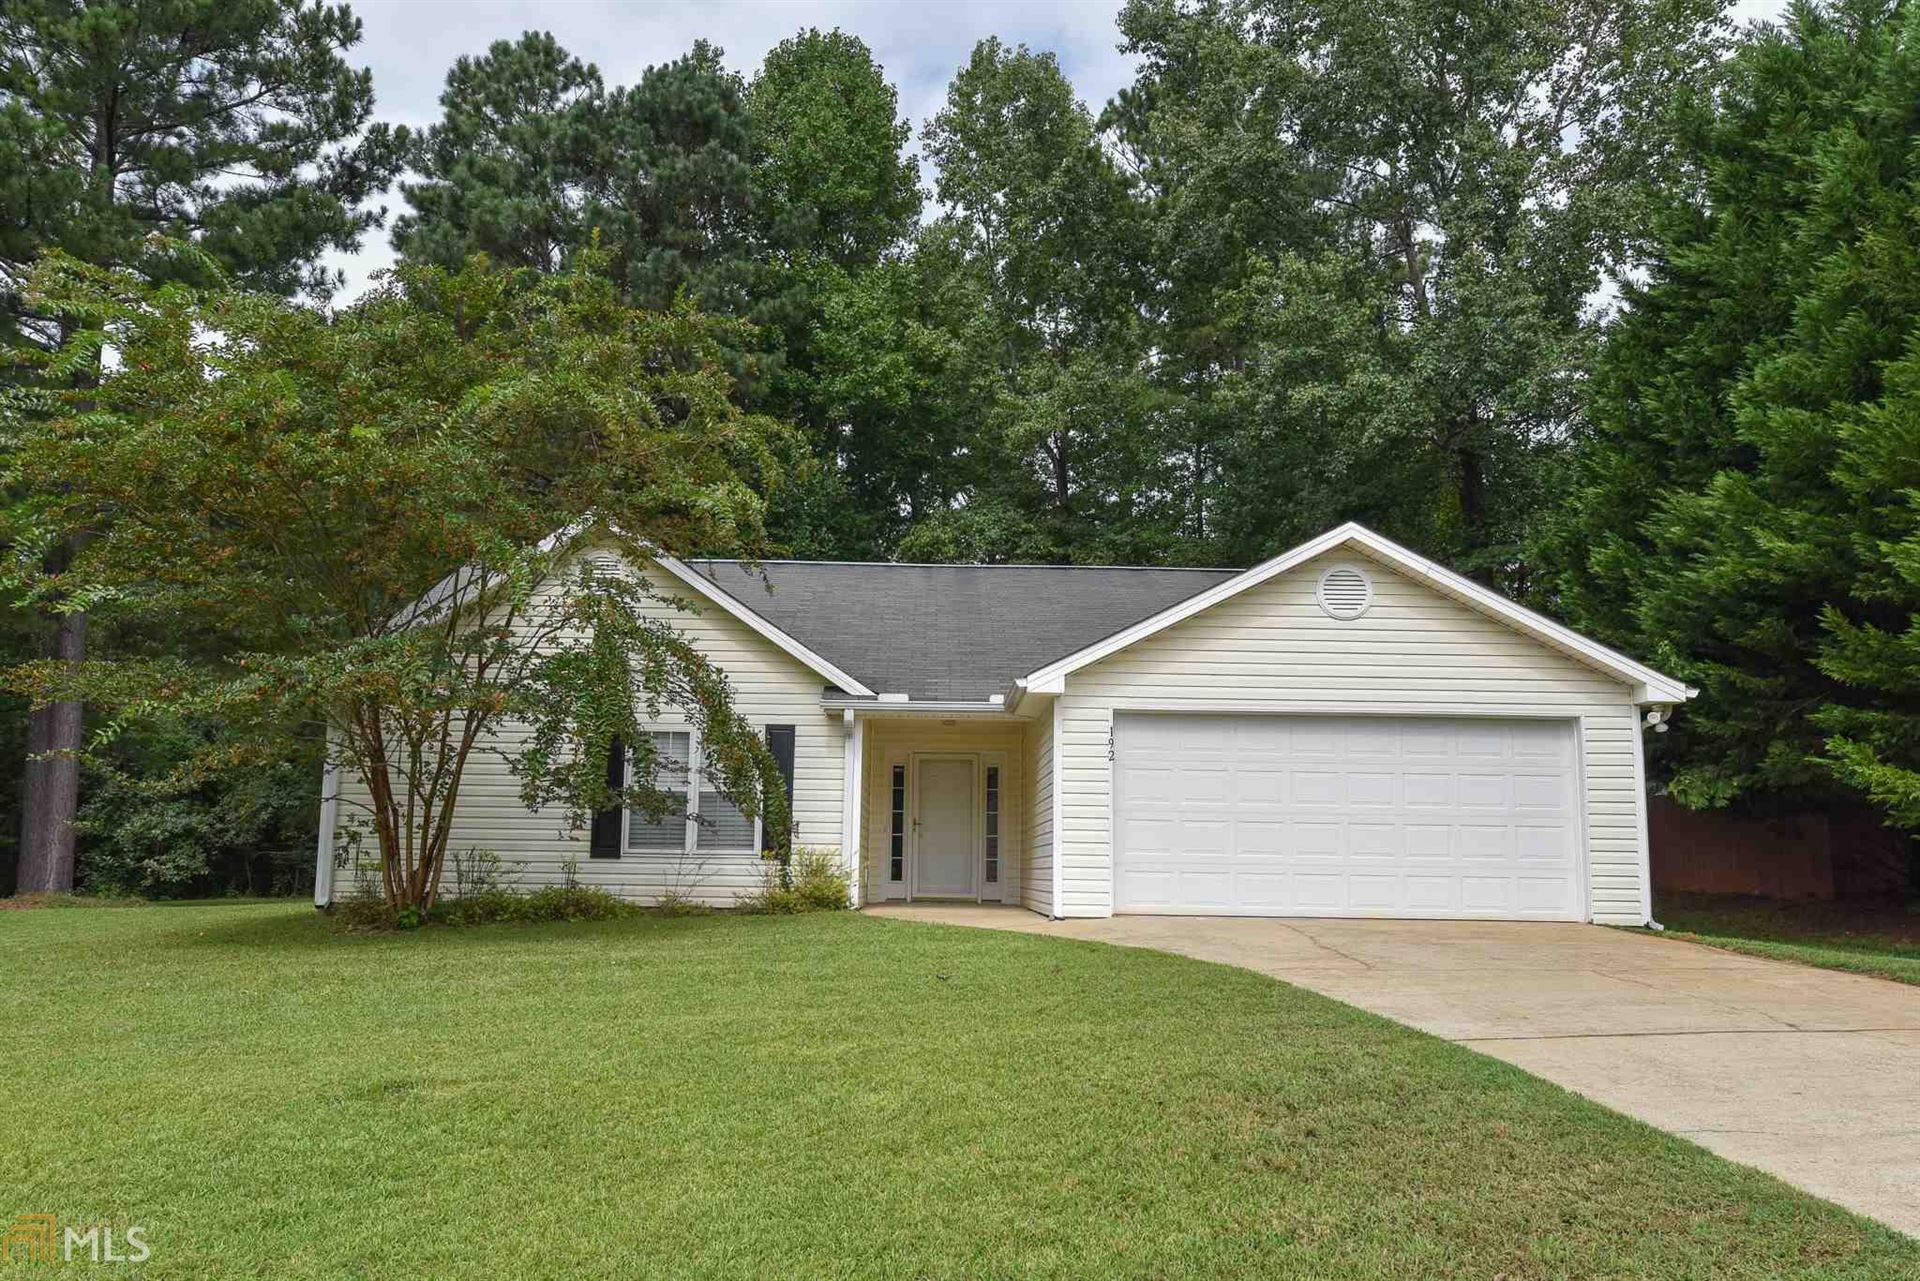 192 Sweetgum Way, Athens, GA 30601 - #: 8862133